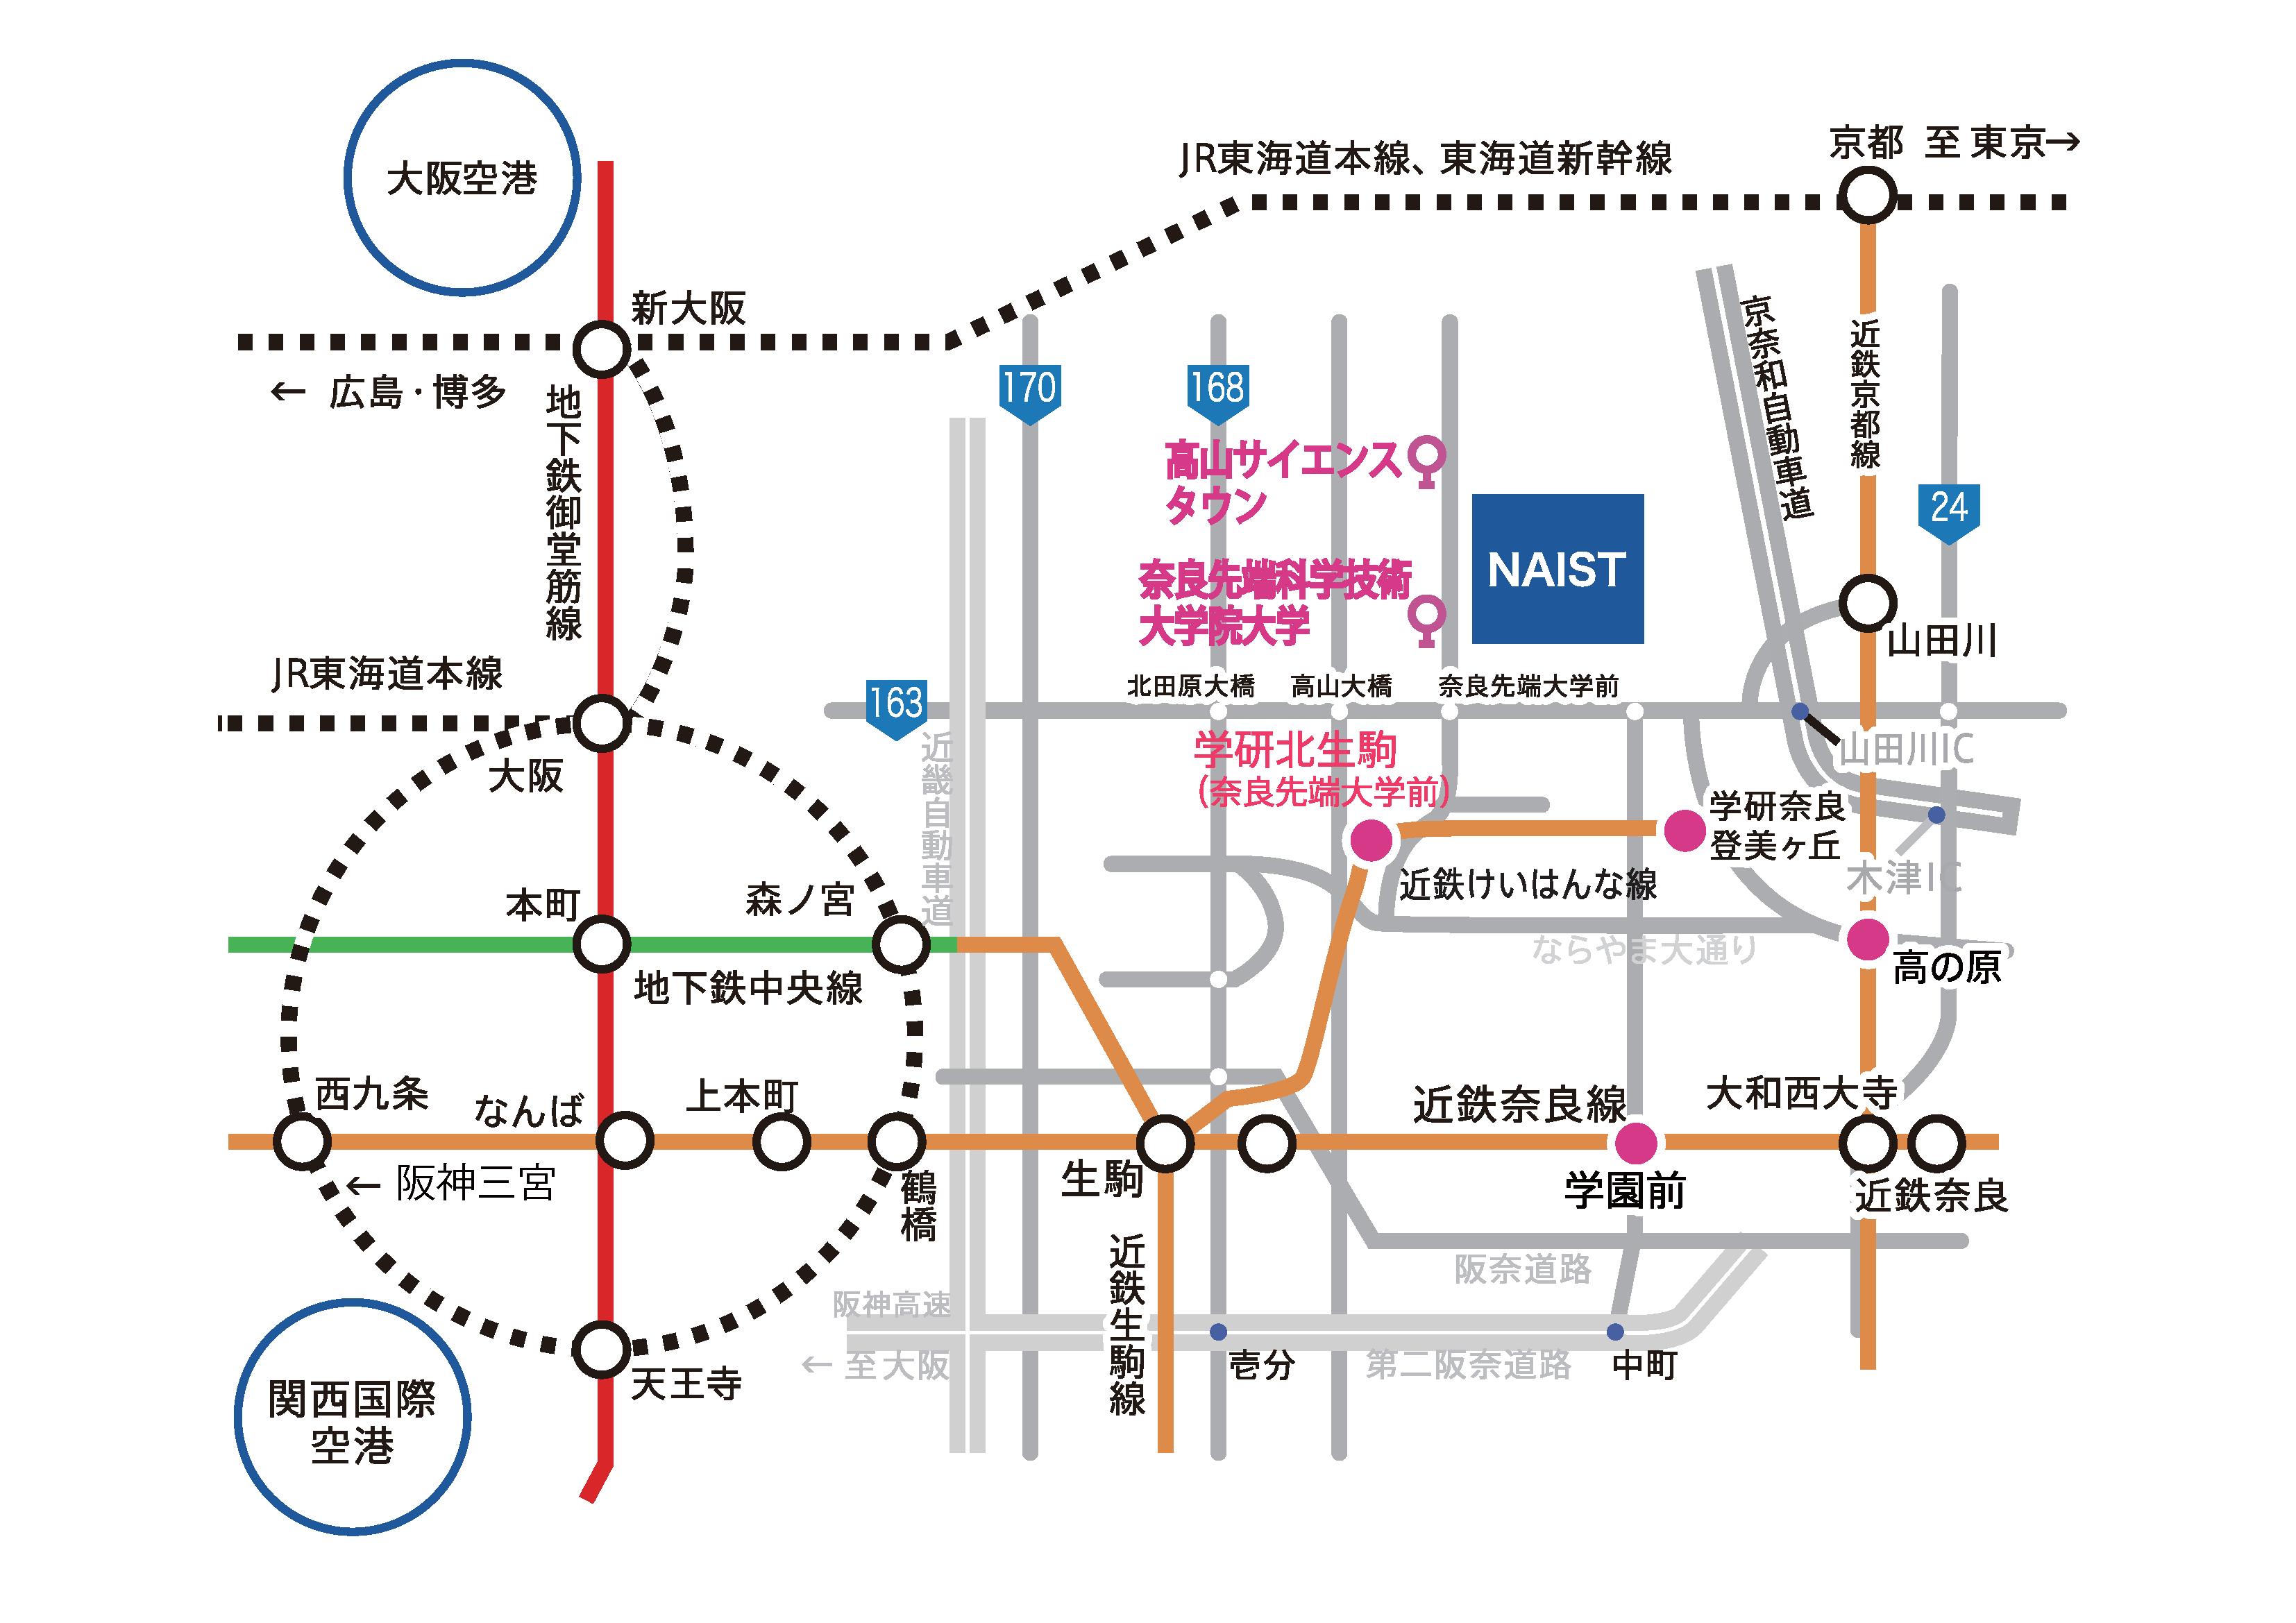 http://www.naist.jp/accessmap/